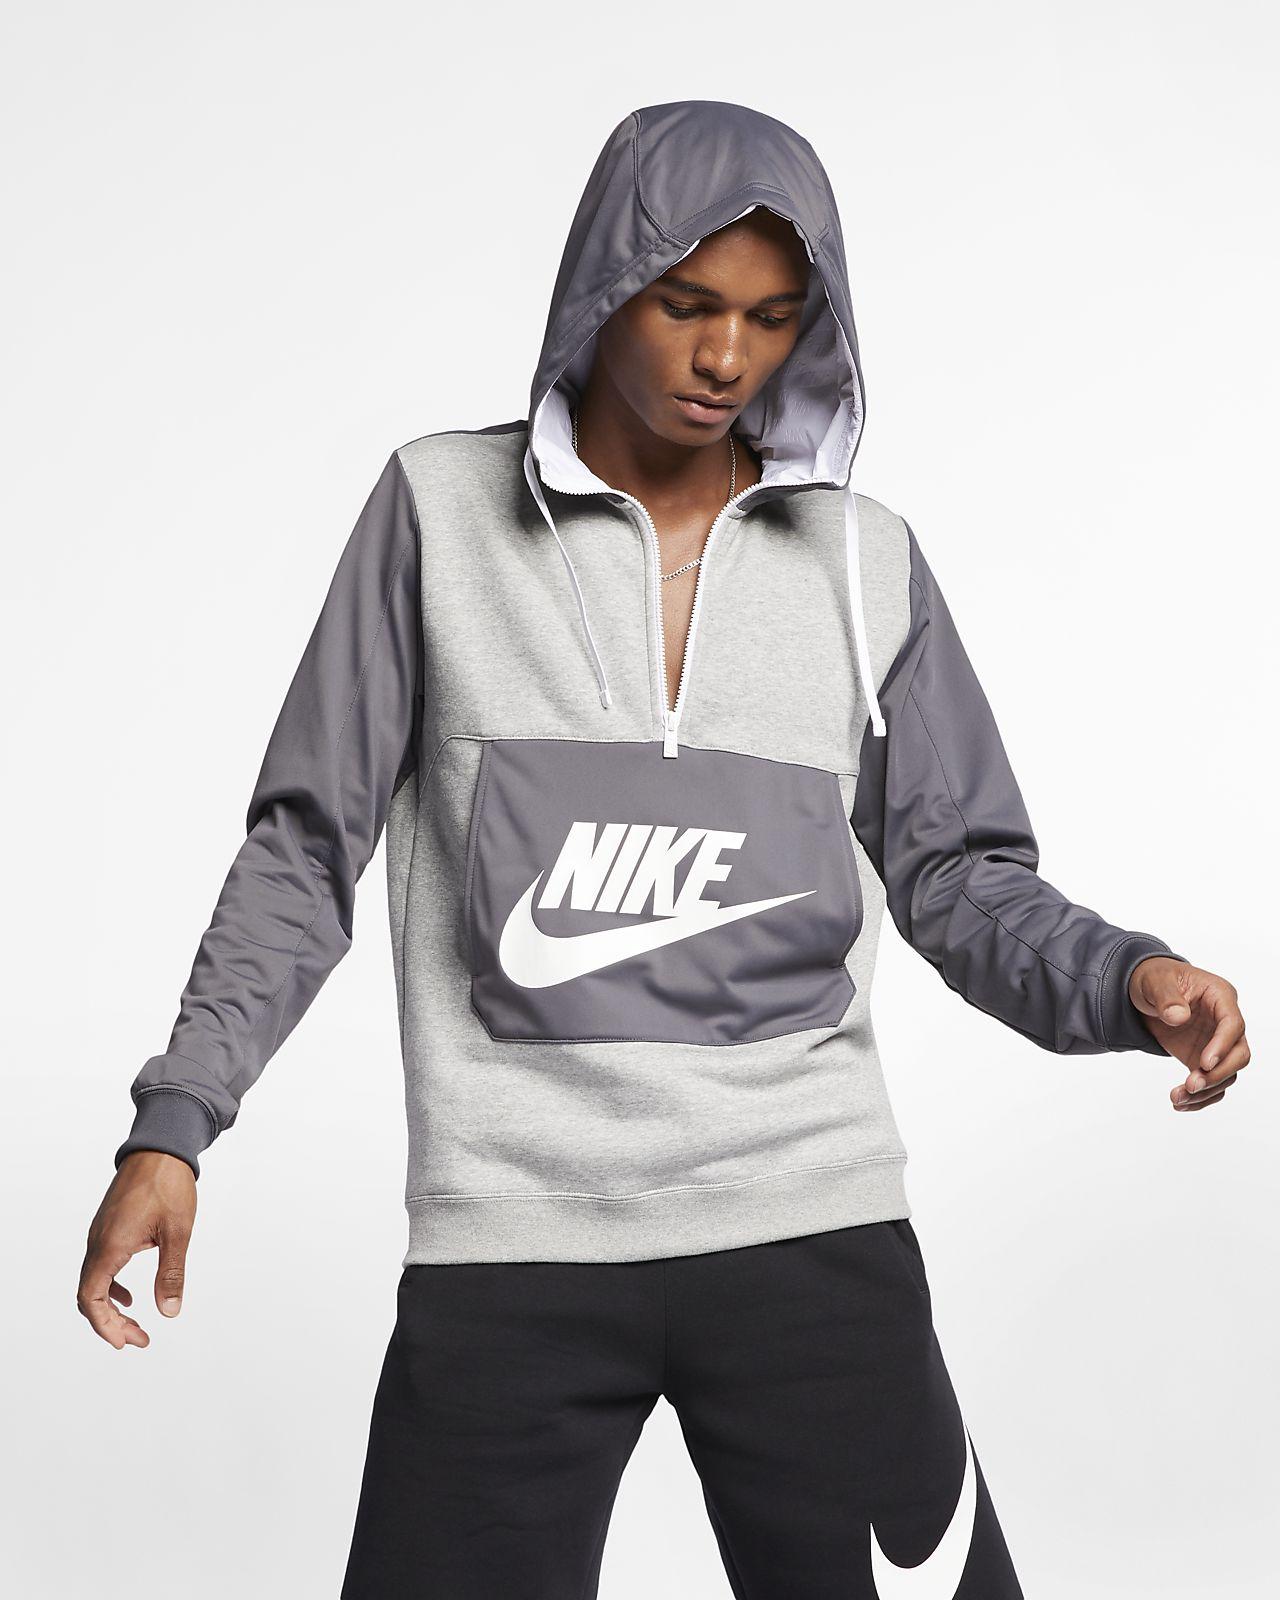 f2b24e3951de Nike Sportswear Men s 1 2-Zip Hoodie. Nike.com